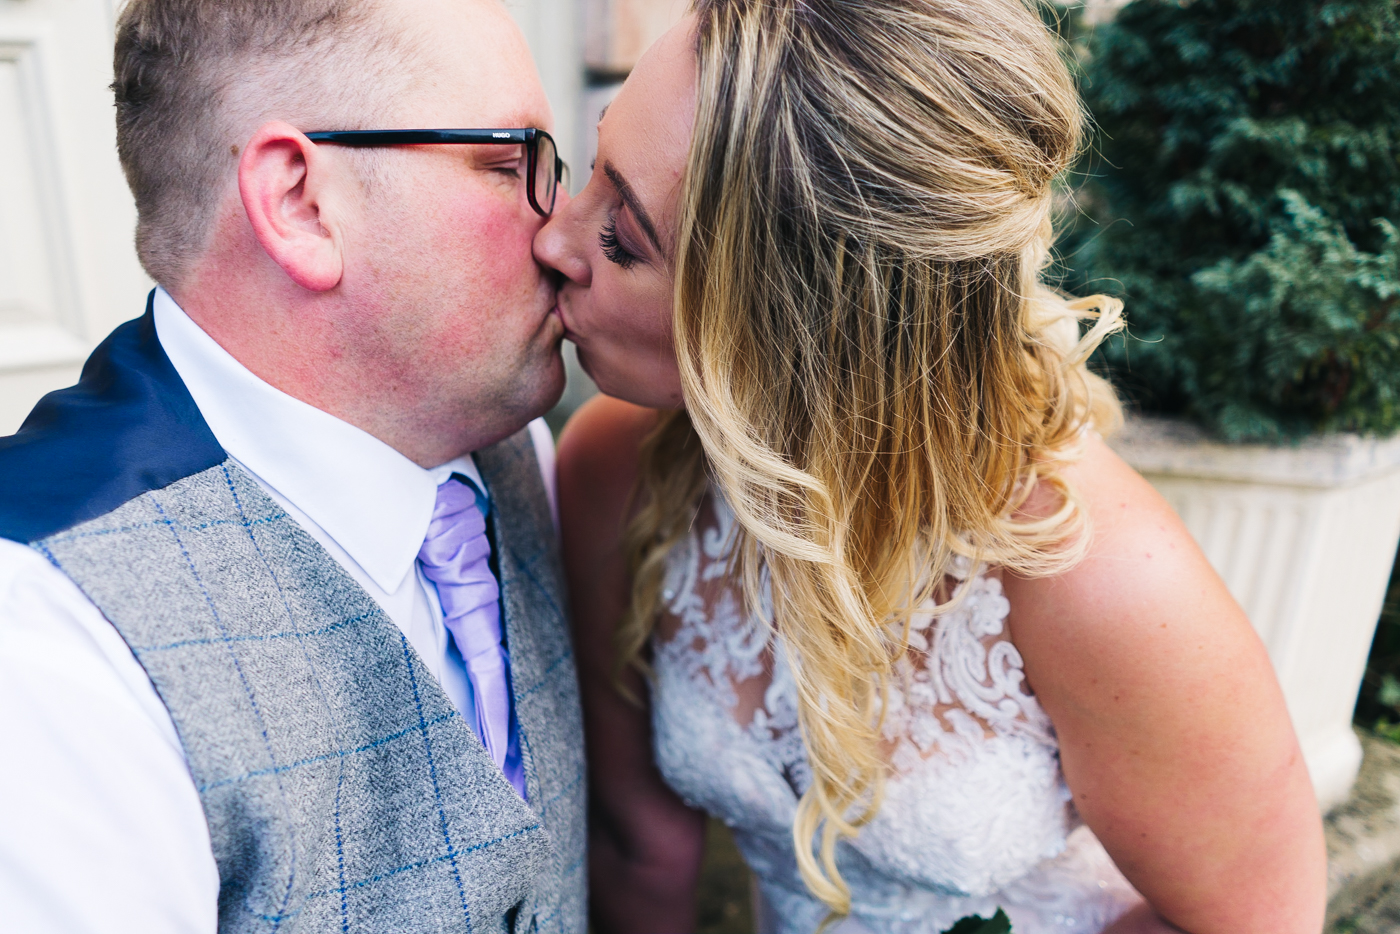 headlame-hall-north-yorkshire-north-east-photographer-wedding-0050.jpg